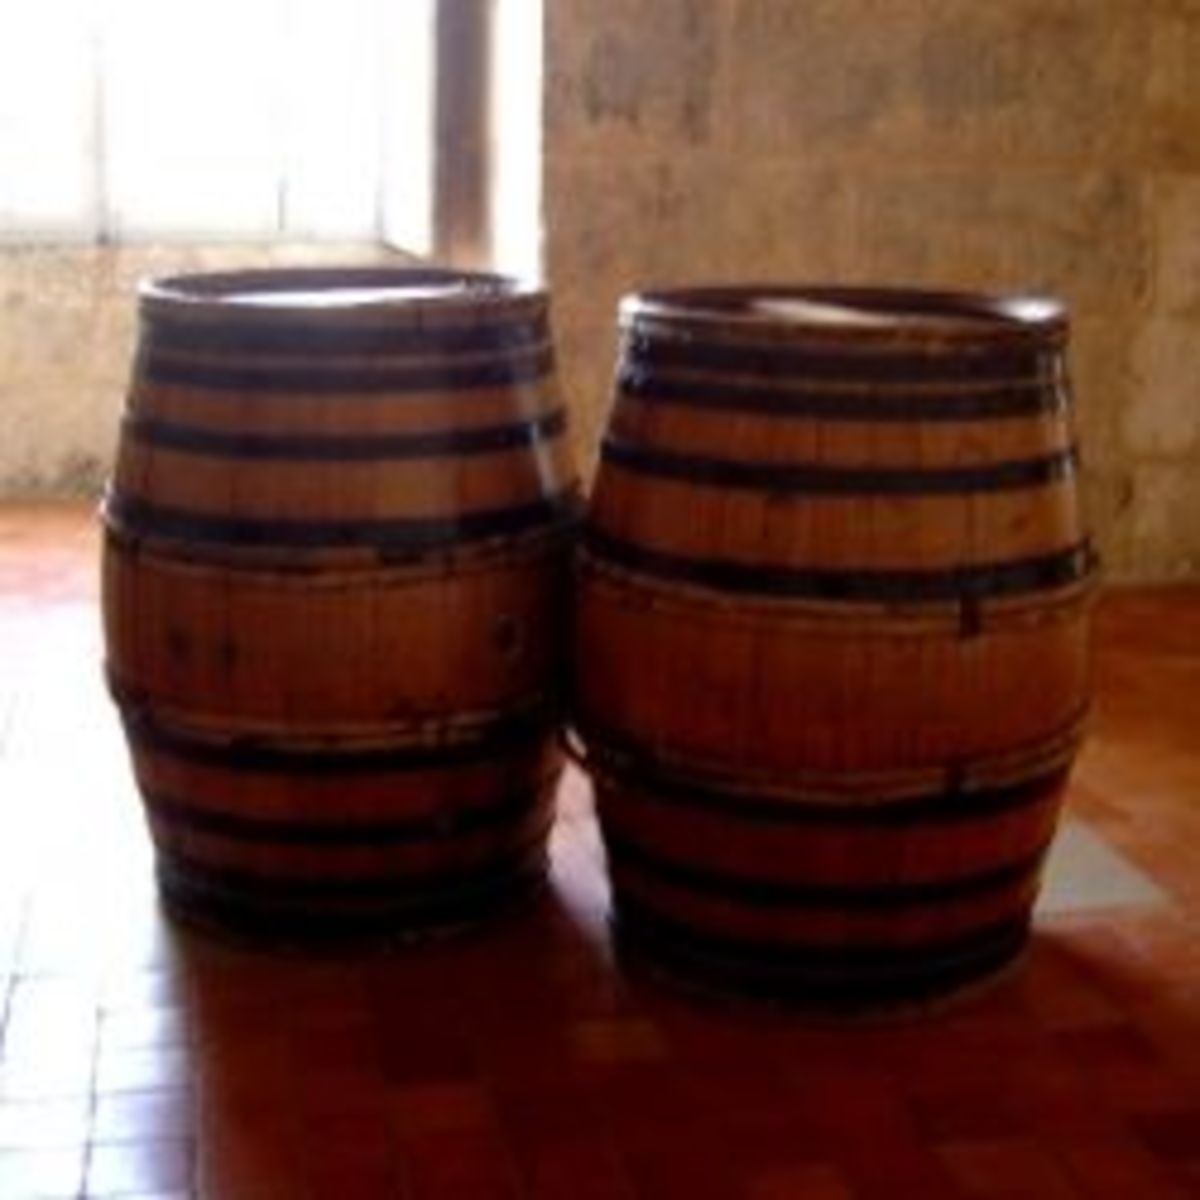 Oak Barrels in Cognac, France